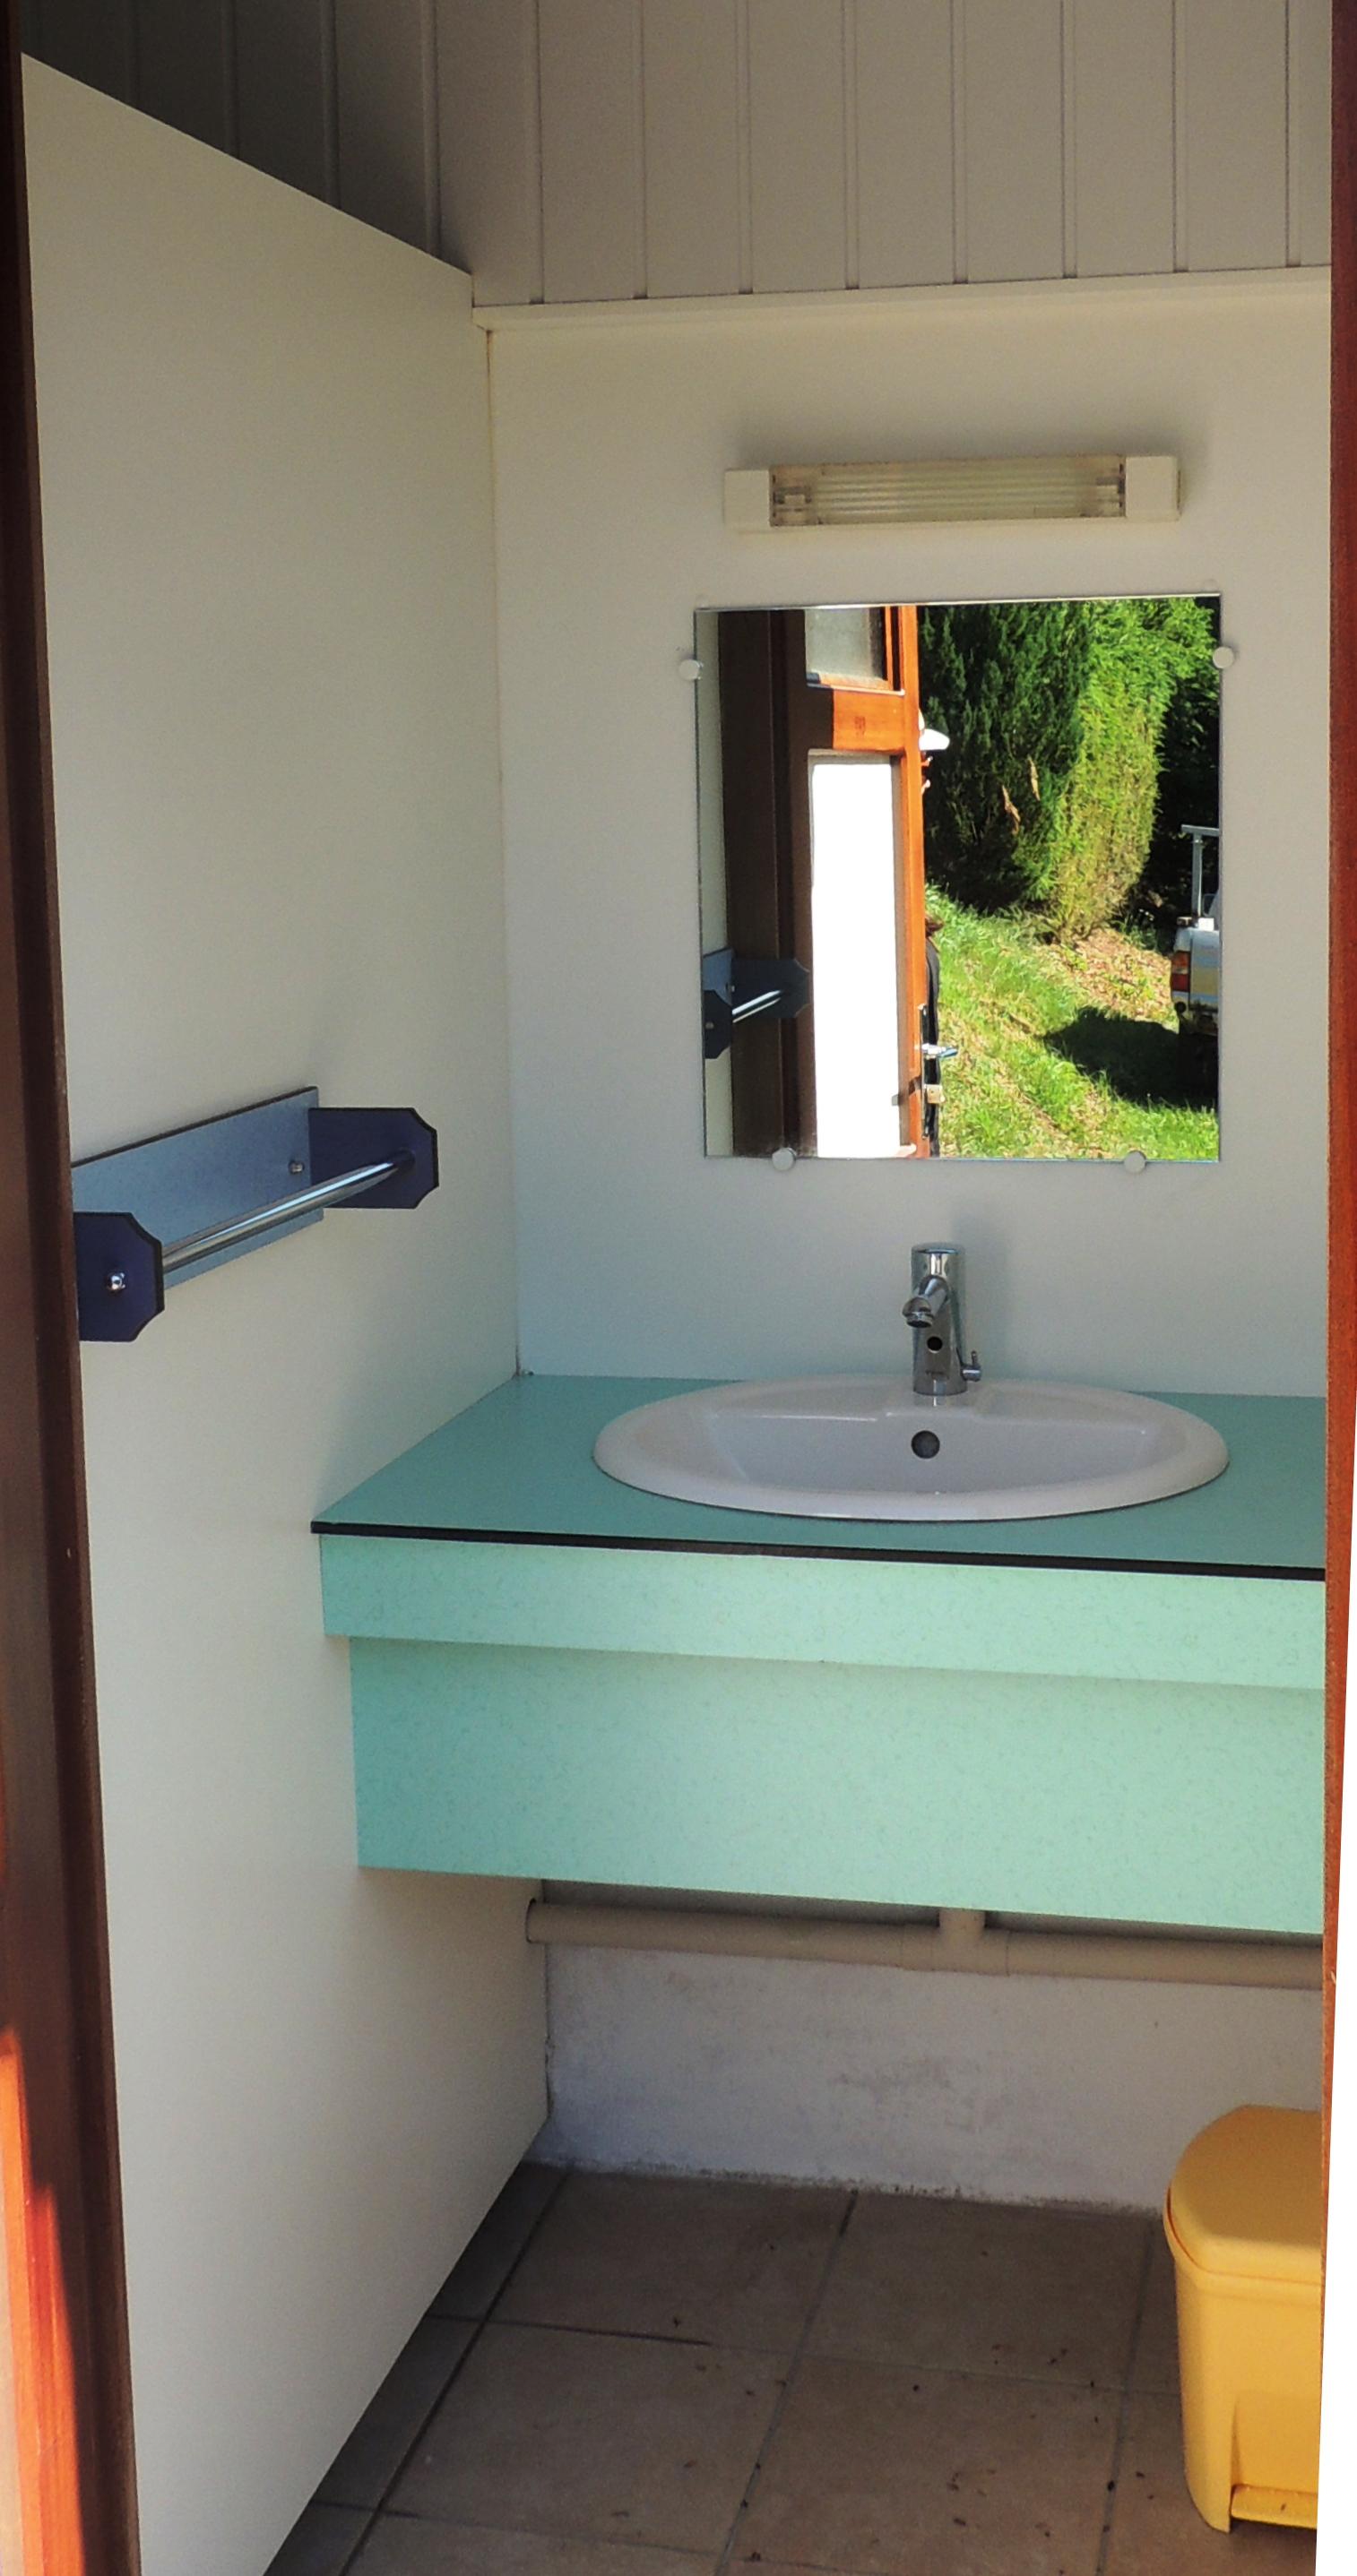 auvergne-camping mont dore-cabine lavabo